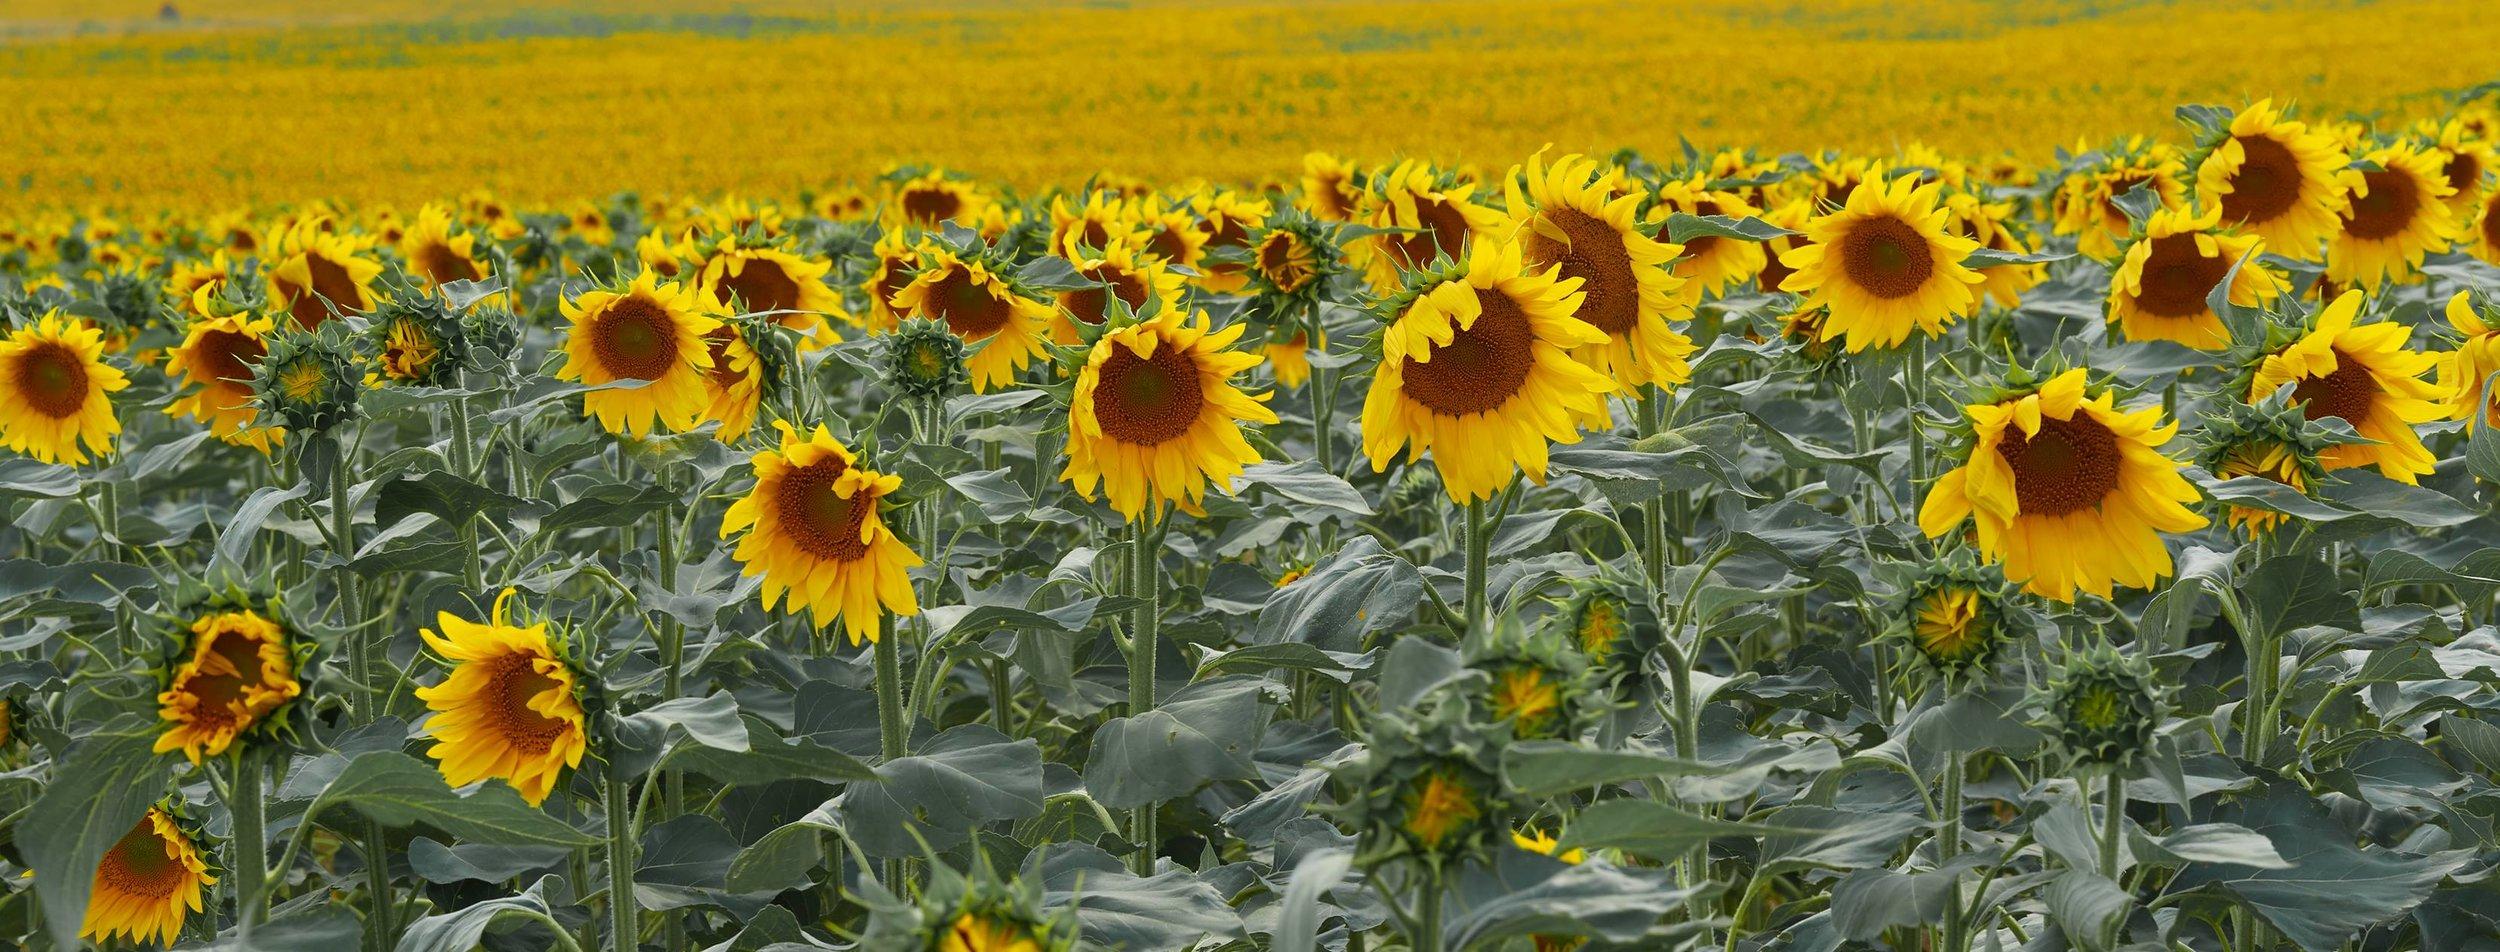 Aaron-Bowen-sunflowers.jpg